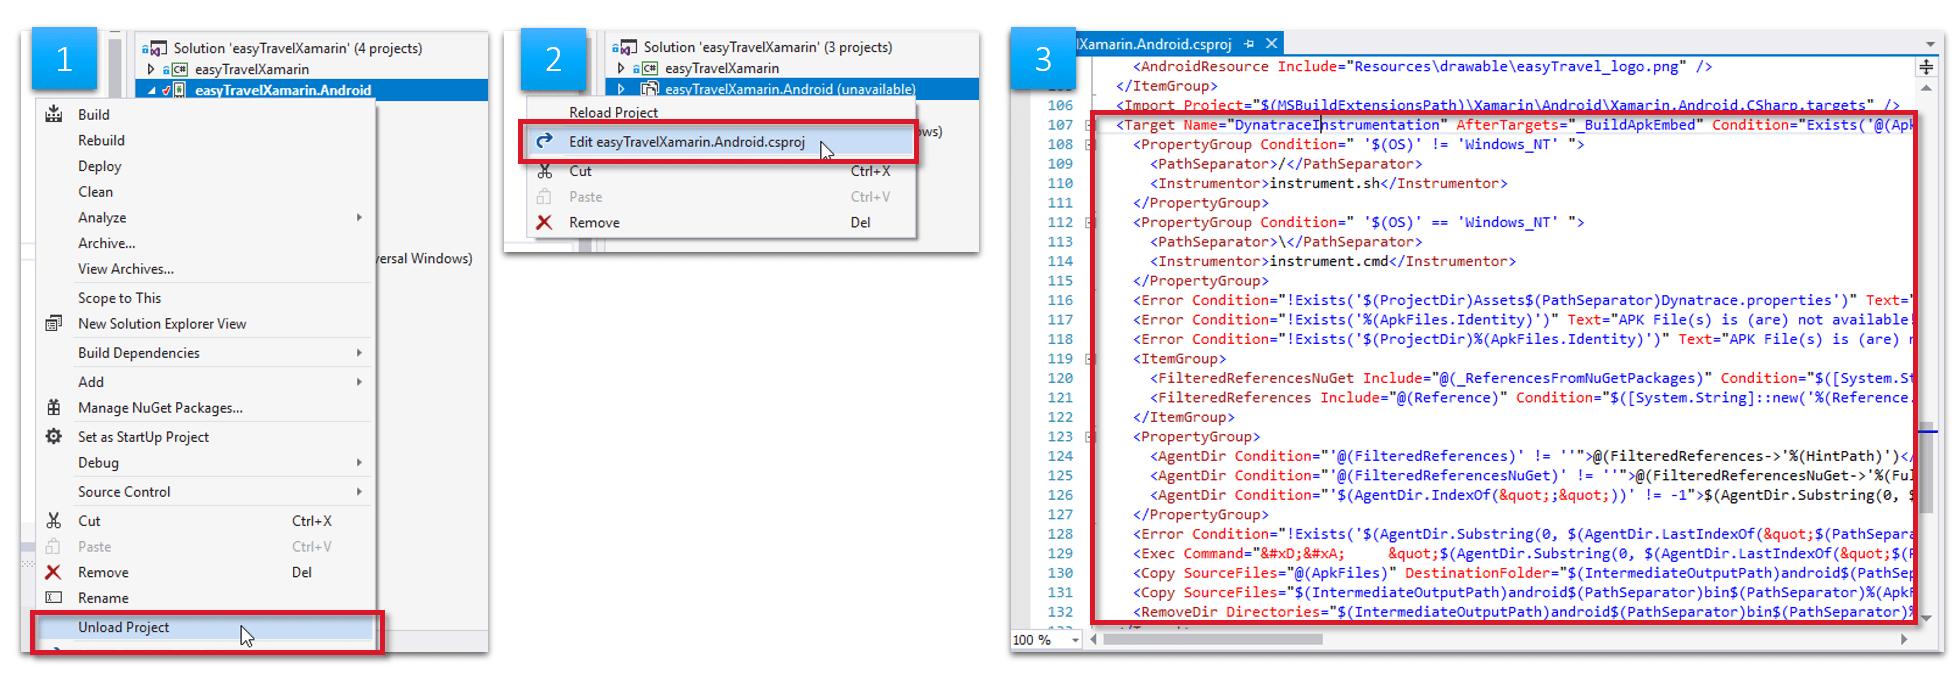 edit the .csproj file